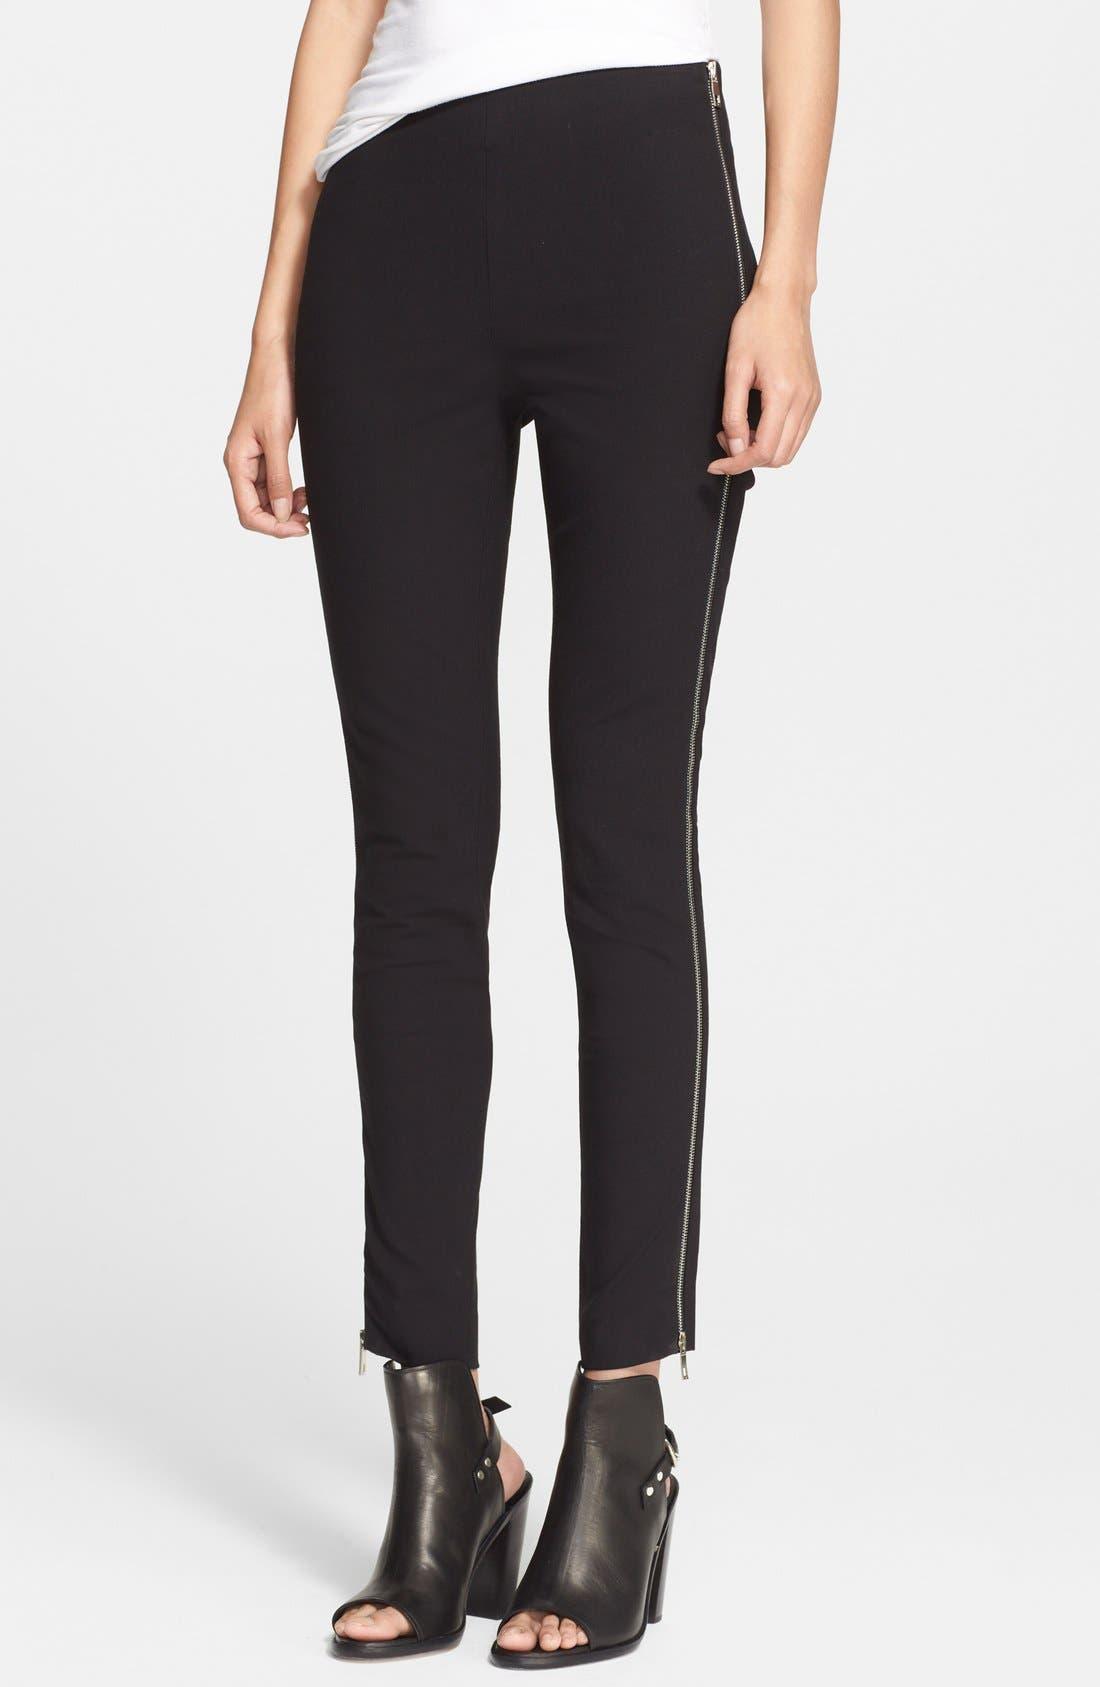 Main Image - rag & bone 'Chatel' Side Zip Pants